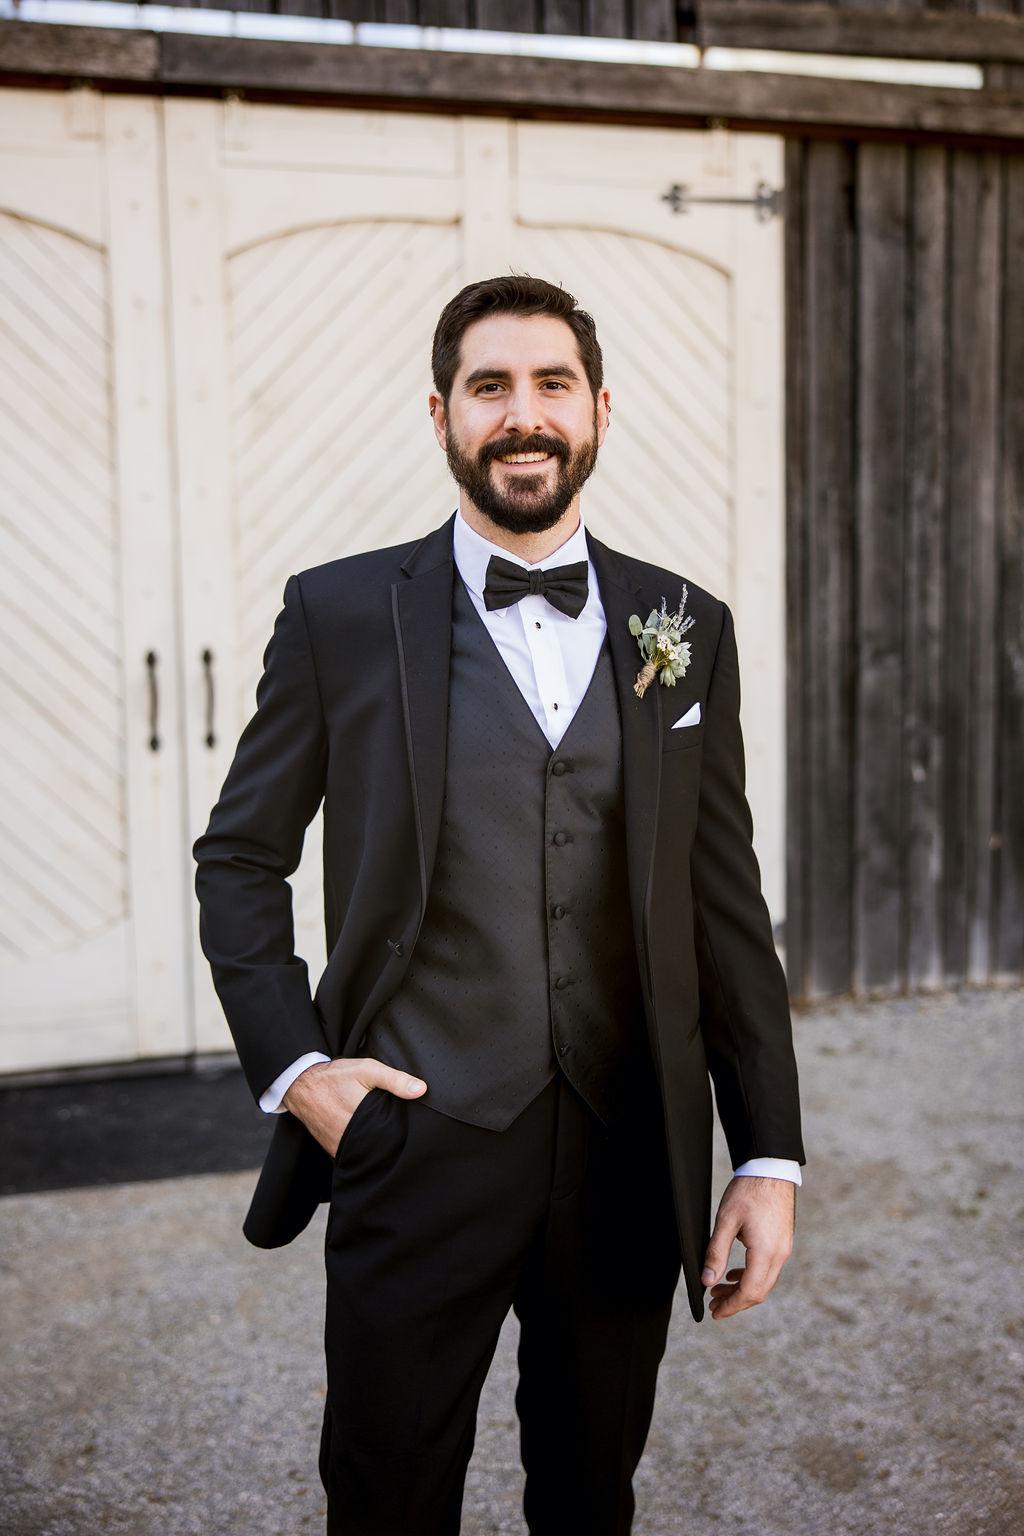 Classic black wedding tuxedo | Nashville Bride Guide